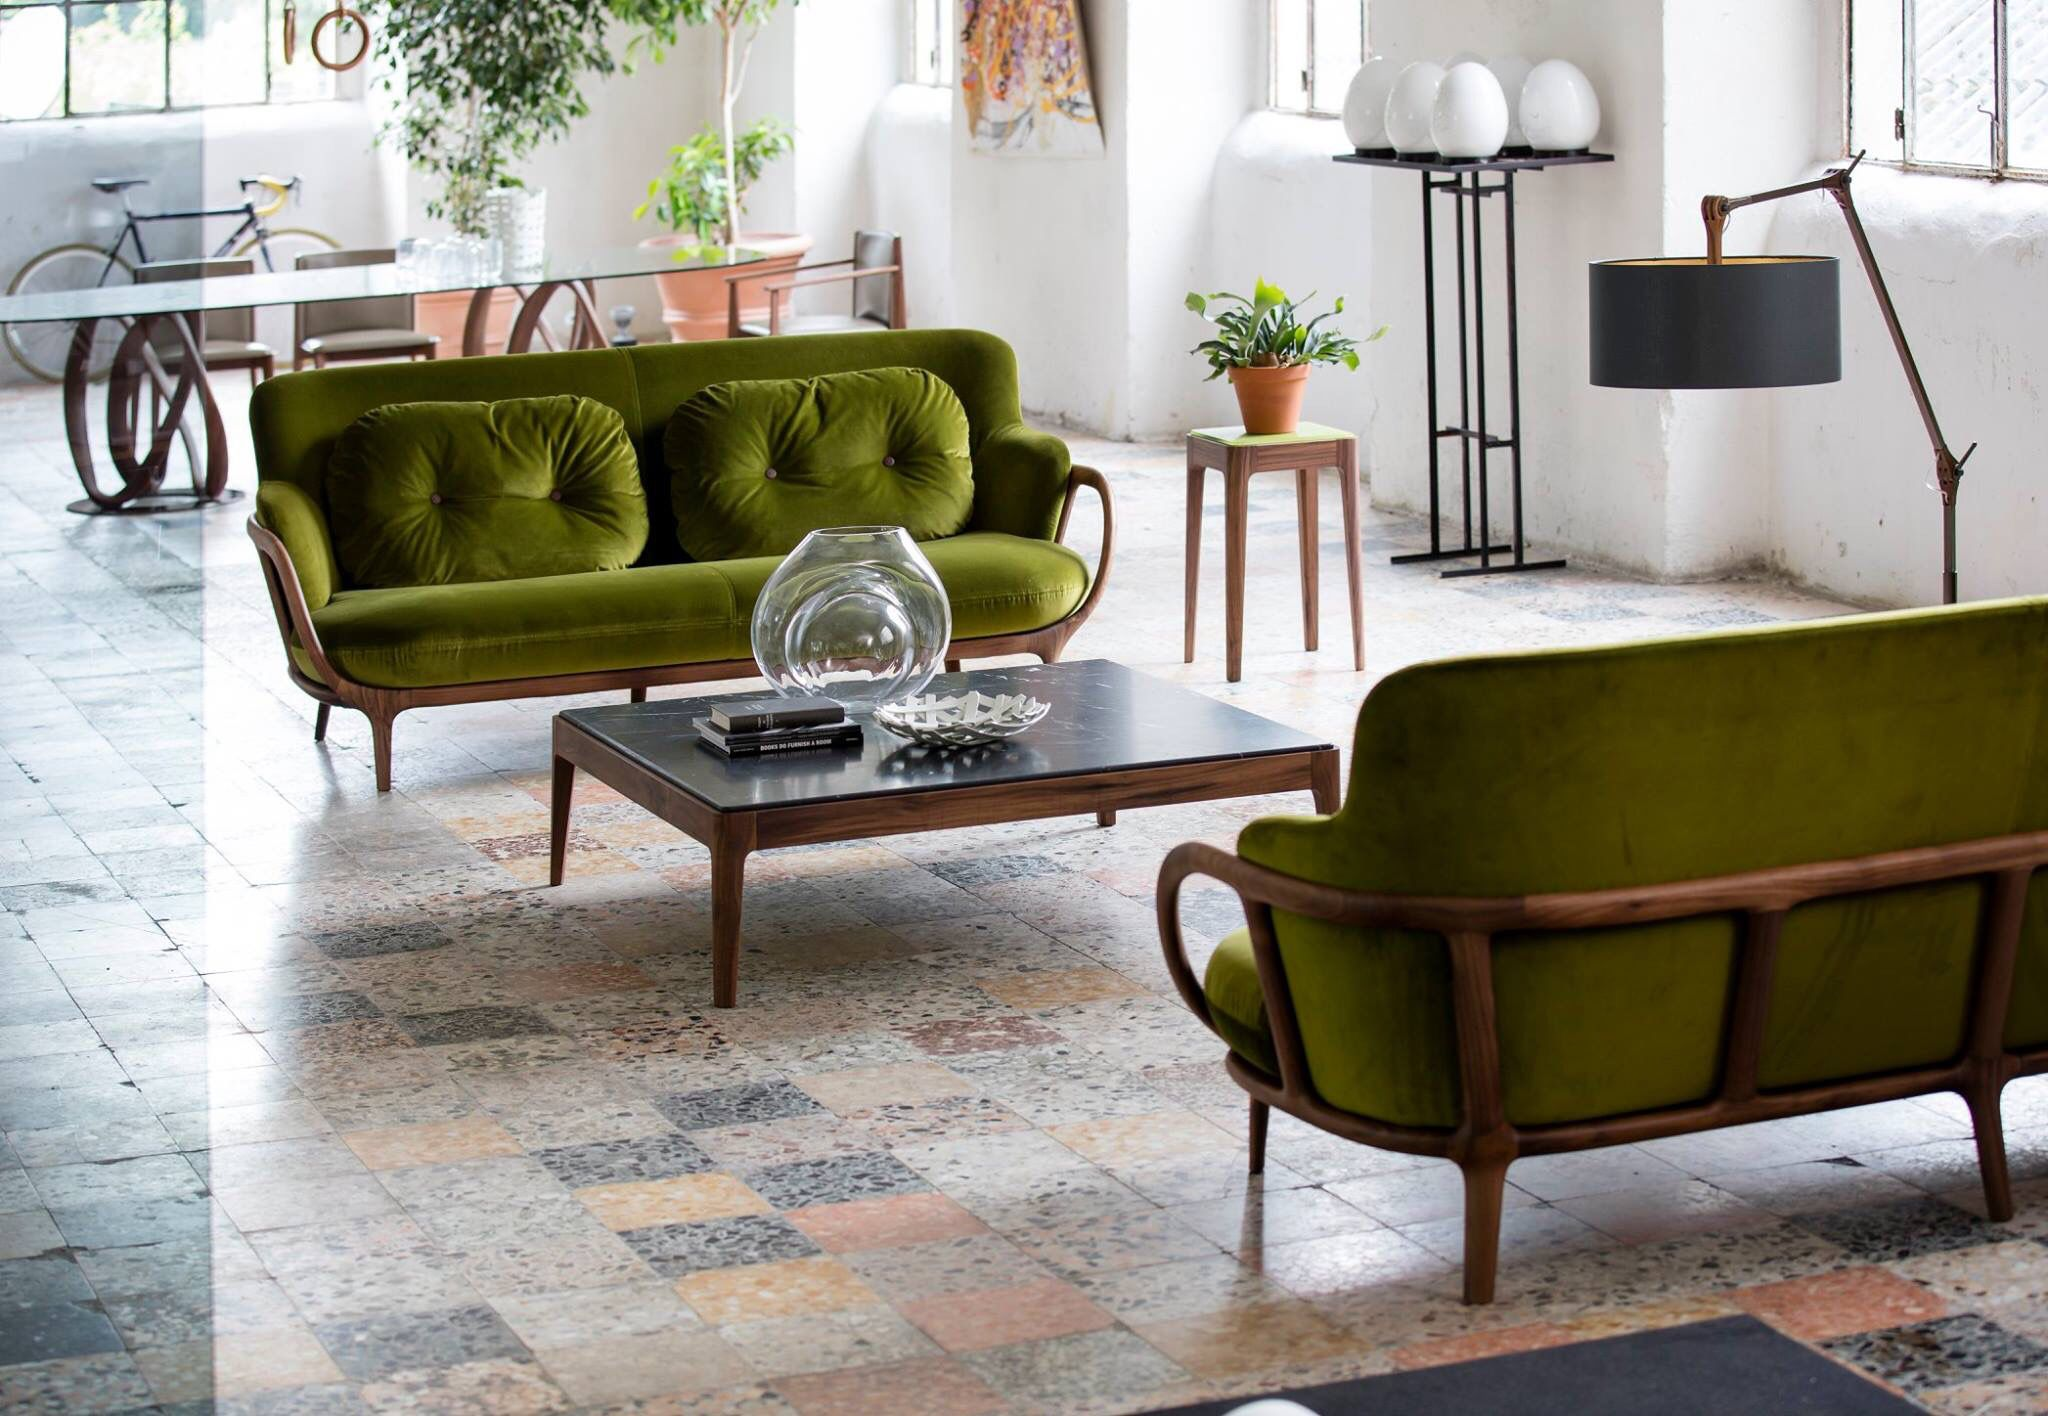 Allison sofas and Ziggy coffee table by Porada